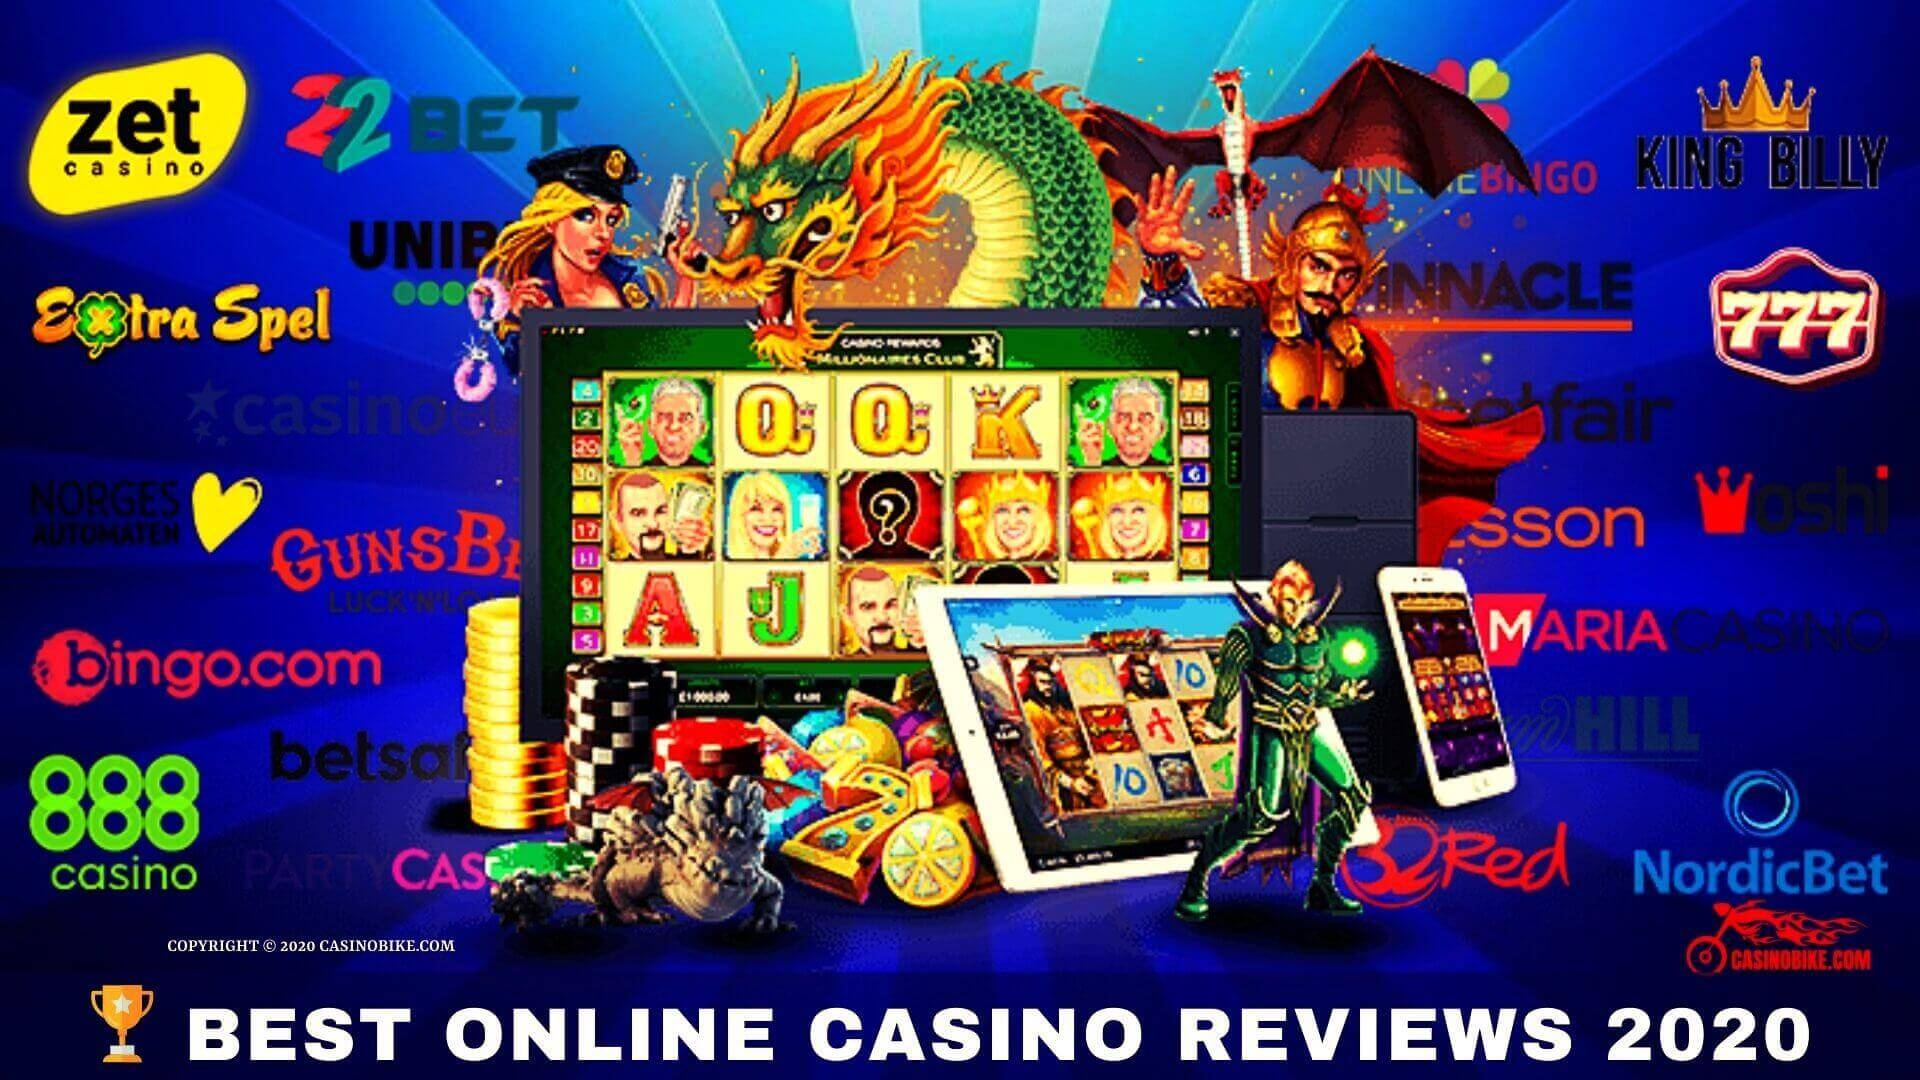 best online casino reviews 2020